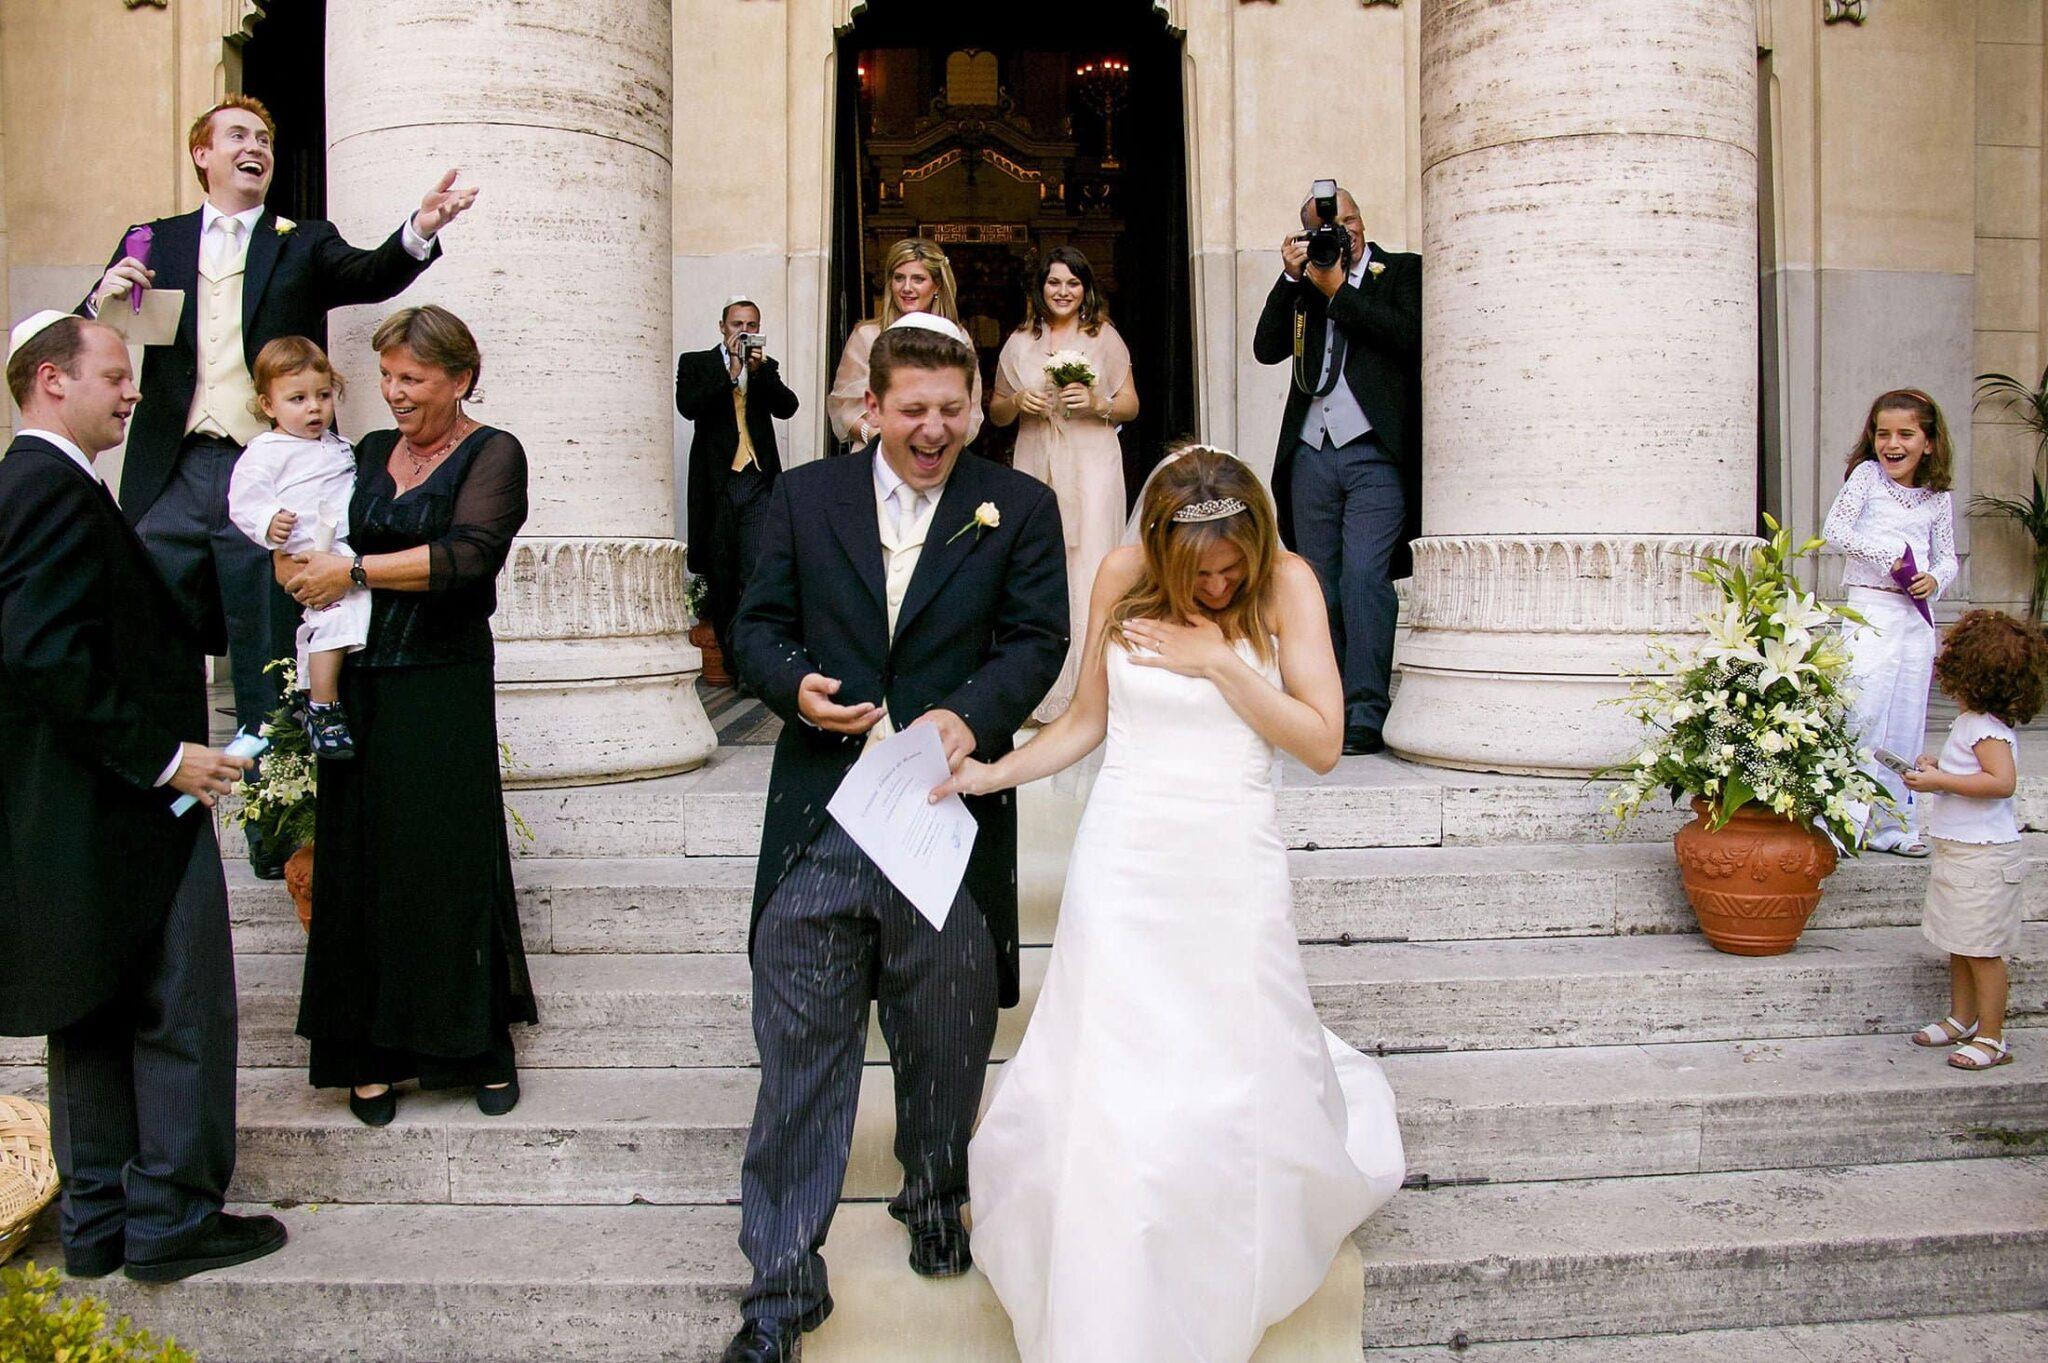 Wedding Photographer Rome | Melissa + Rick